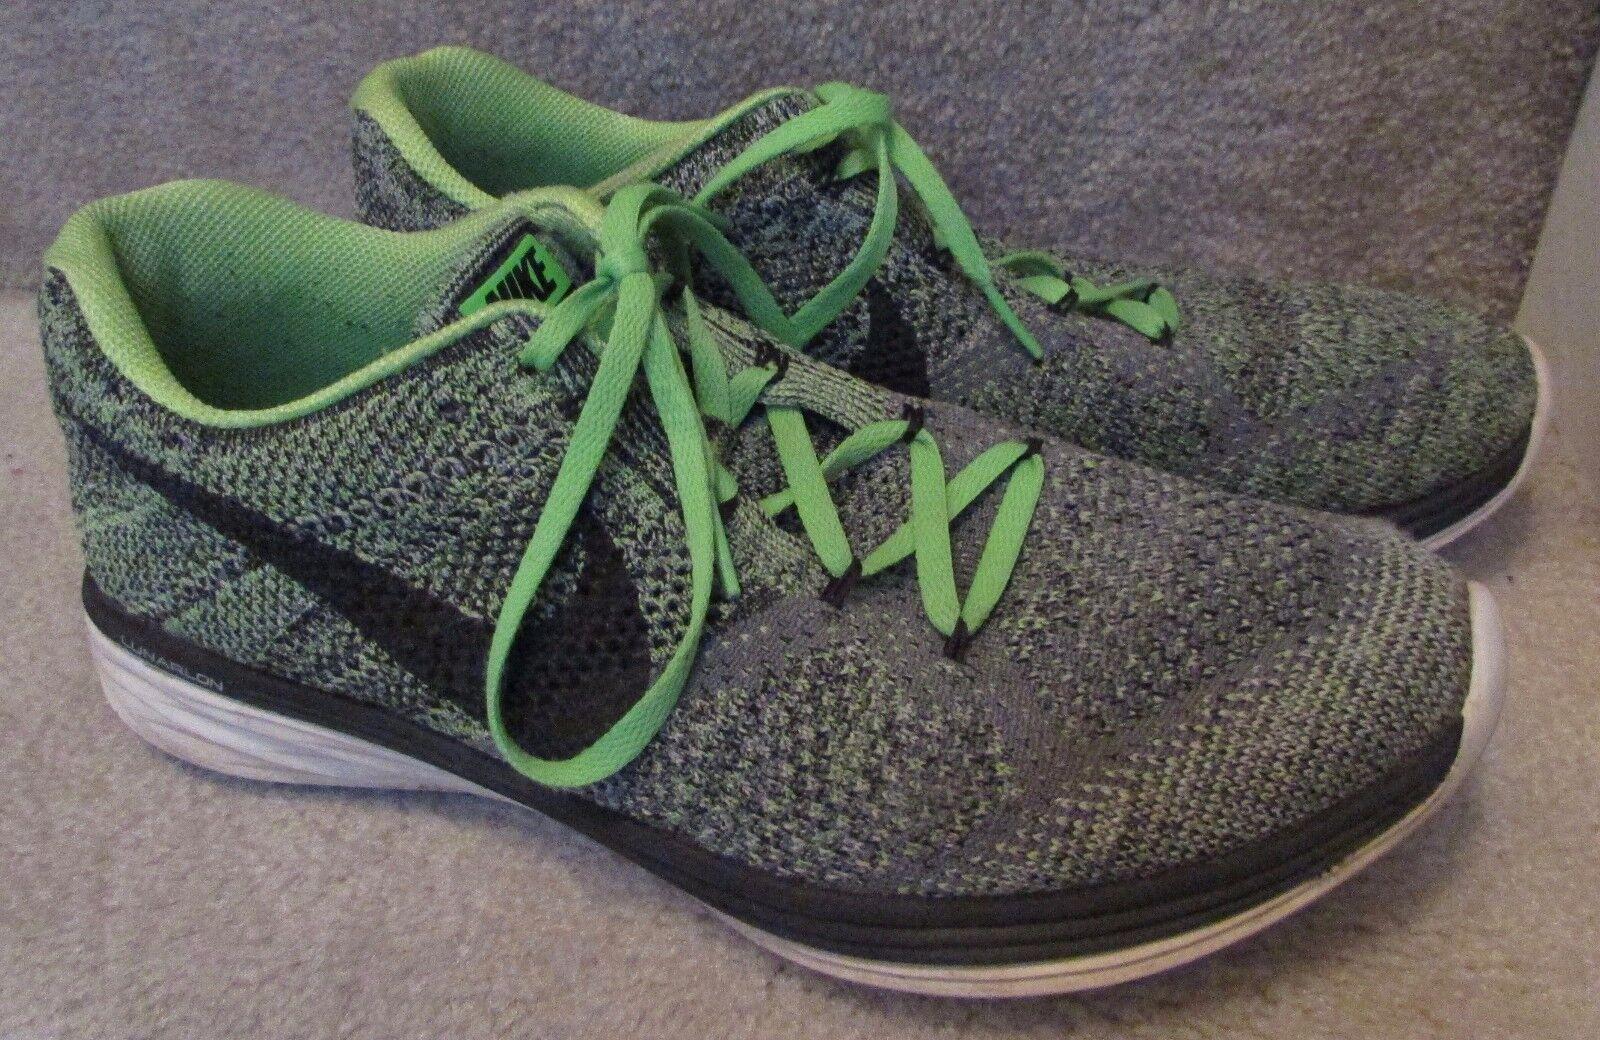 Nike Flyknit Lunar 3 Mens Running shoes Size 11.5 Green 698181-013